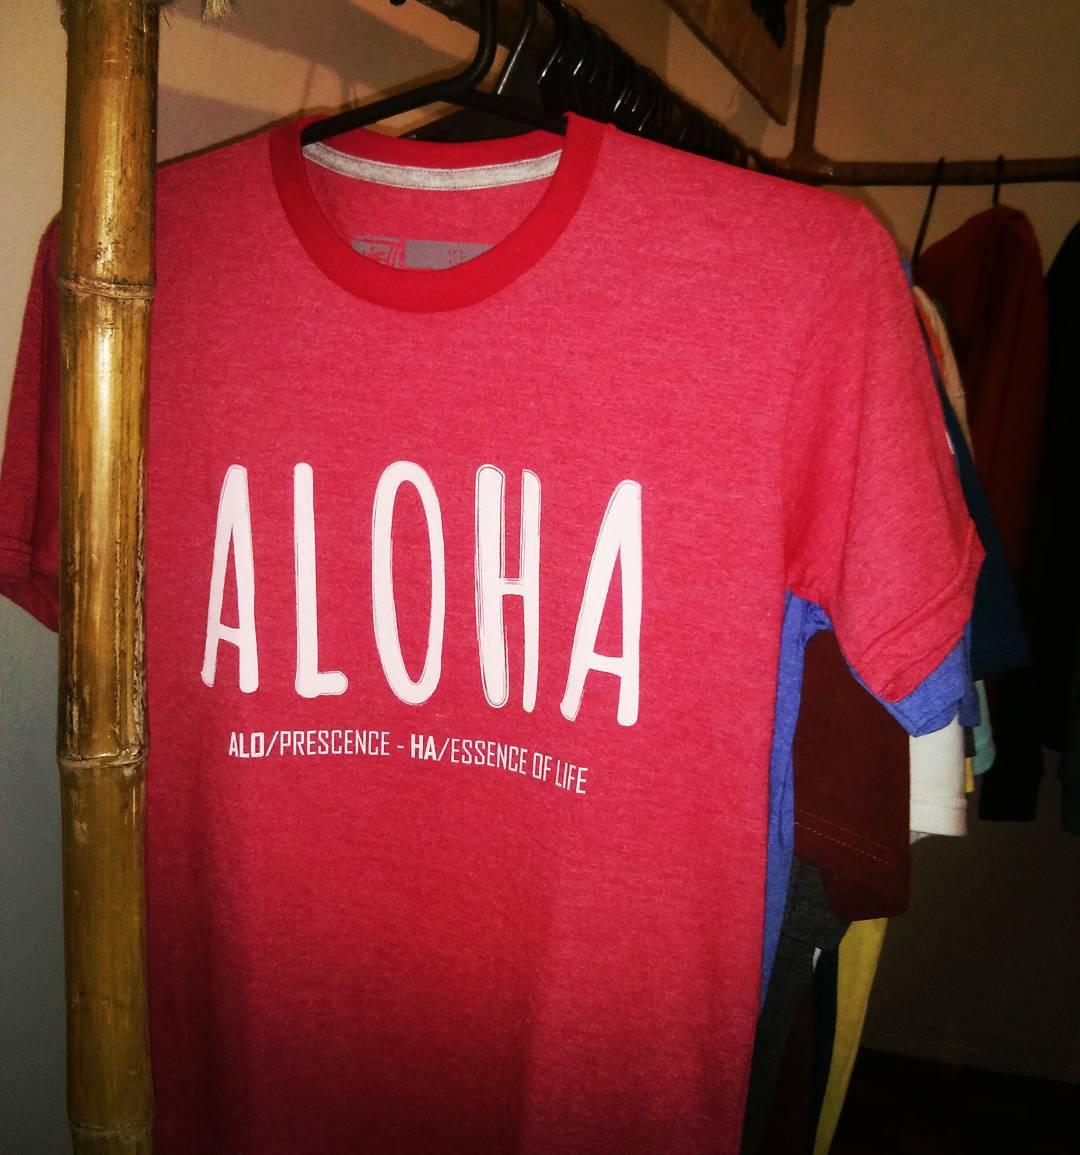 ALOHA TEE! Alo/Prescence - Ha/Essence of Life #maetuanis #surf #surfing #aloha #tee #powerofnow #elpoderdelahora